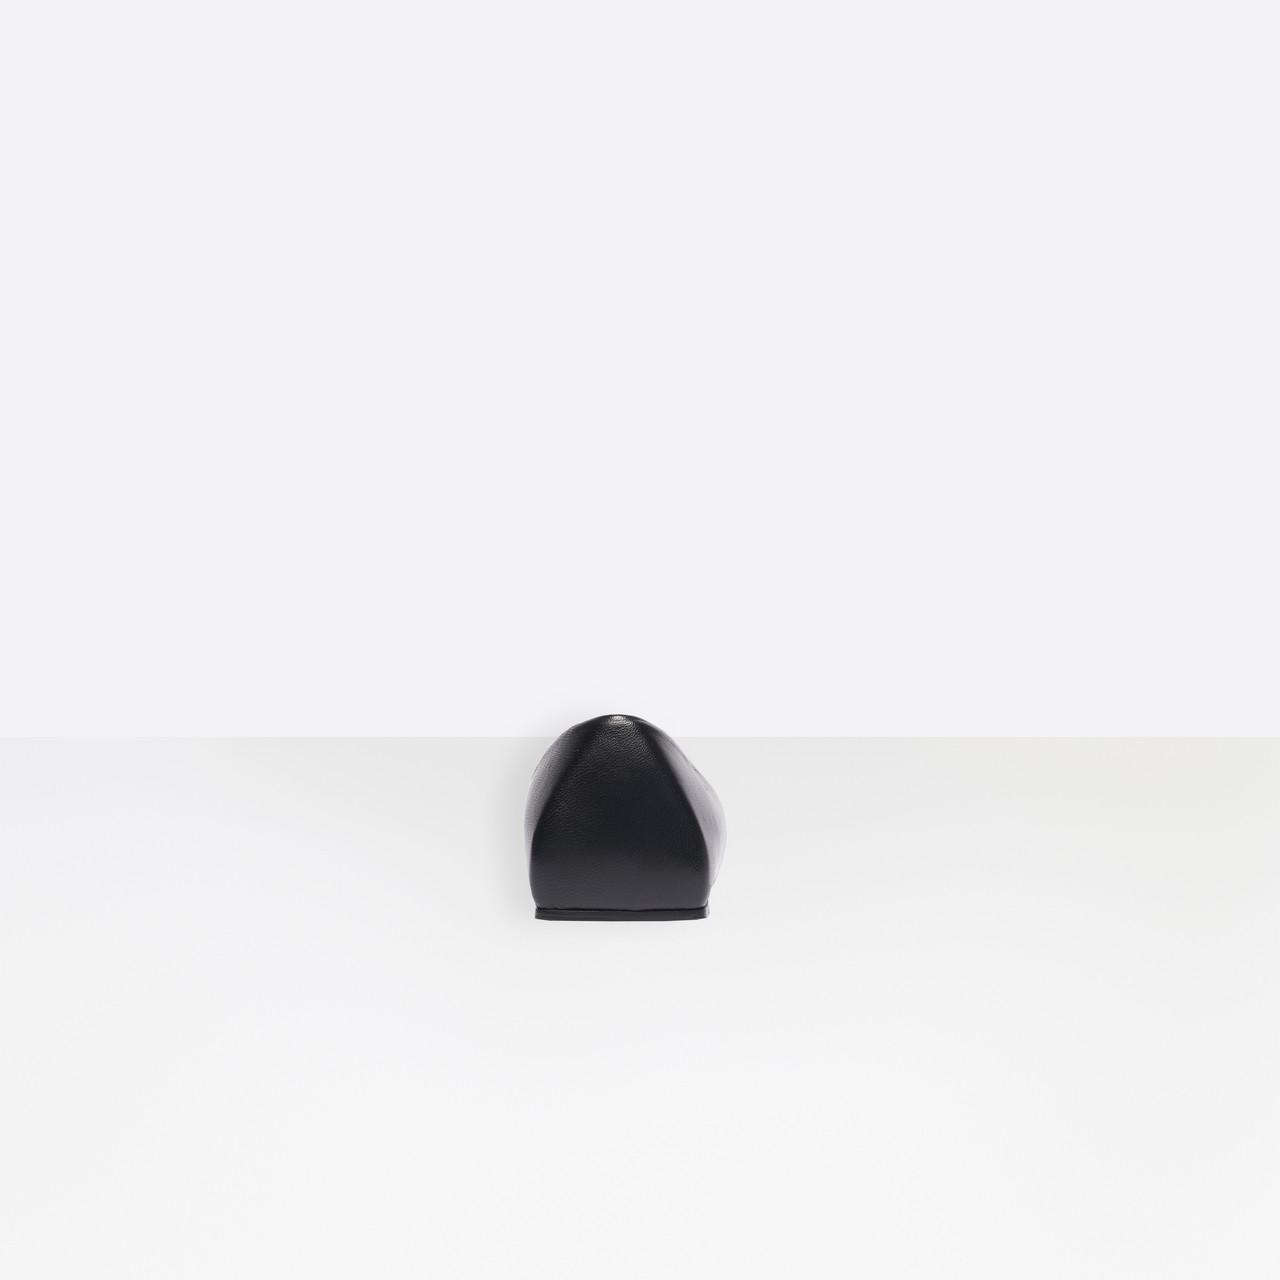 1cc5d16bb Balenciaga - Black Square Knife Bb Flat Ballerinas - Lyst. View fullscreen